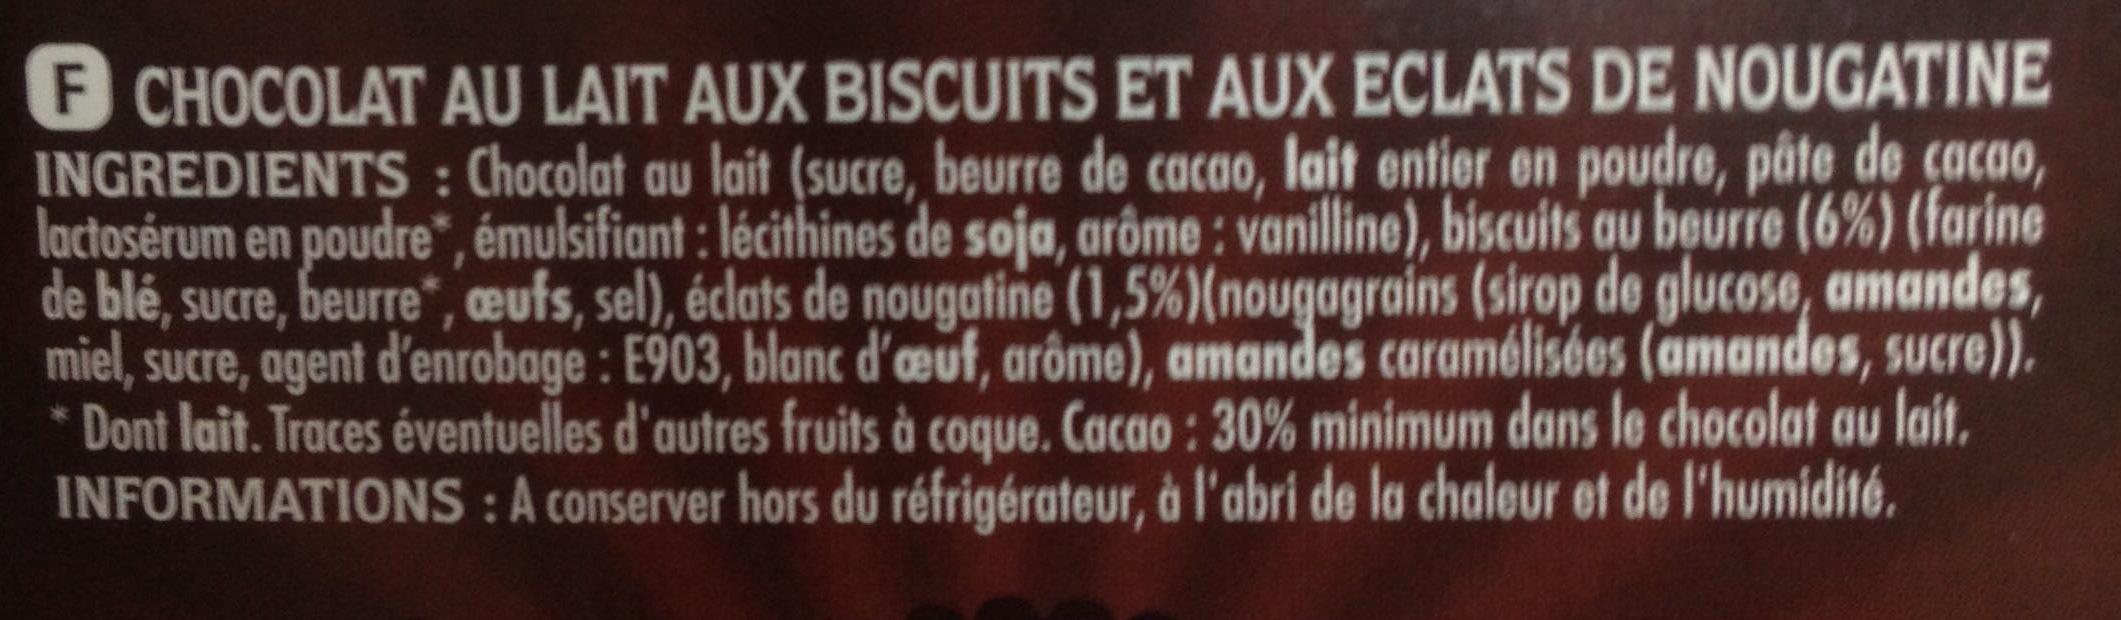 Cookies Addict Lait - Ingrédients